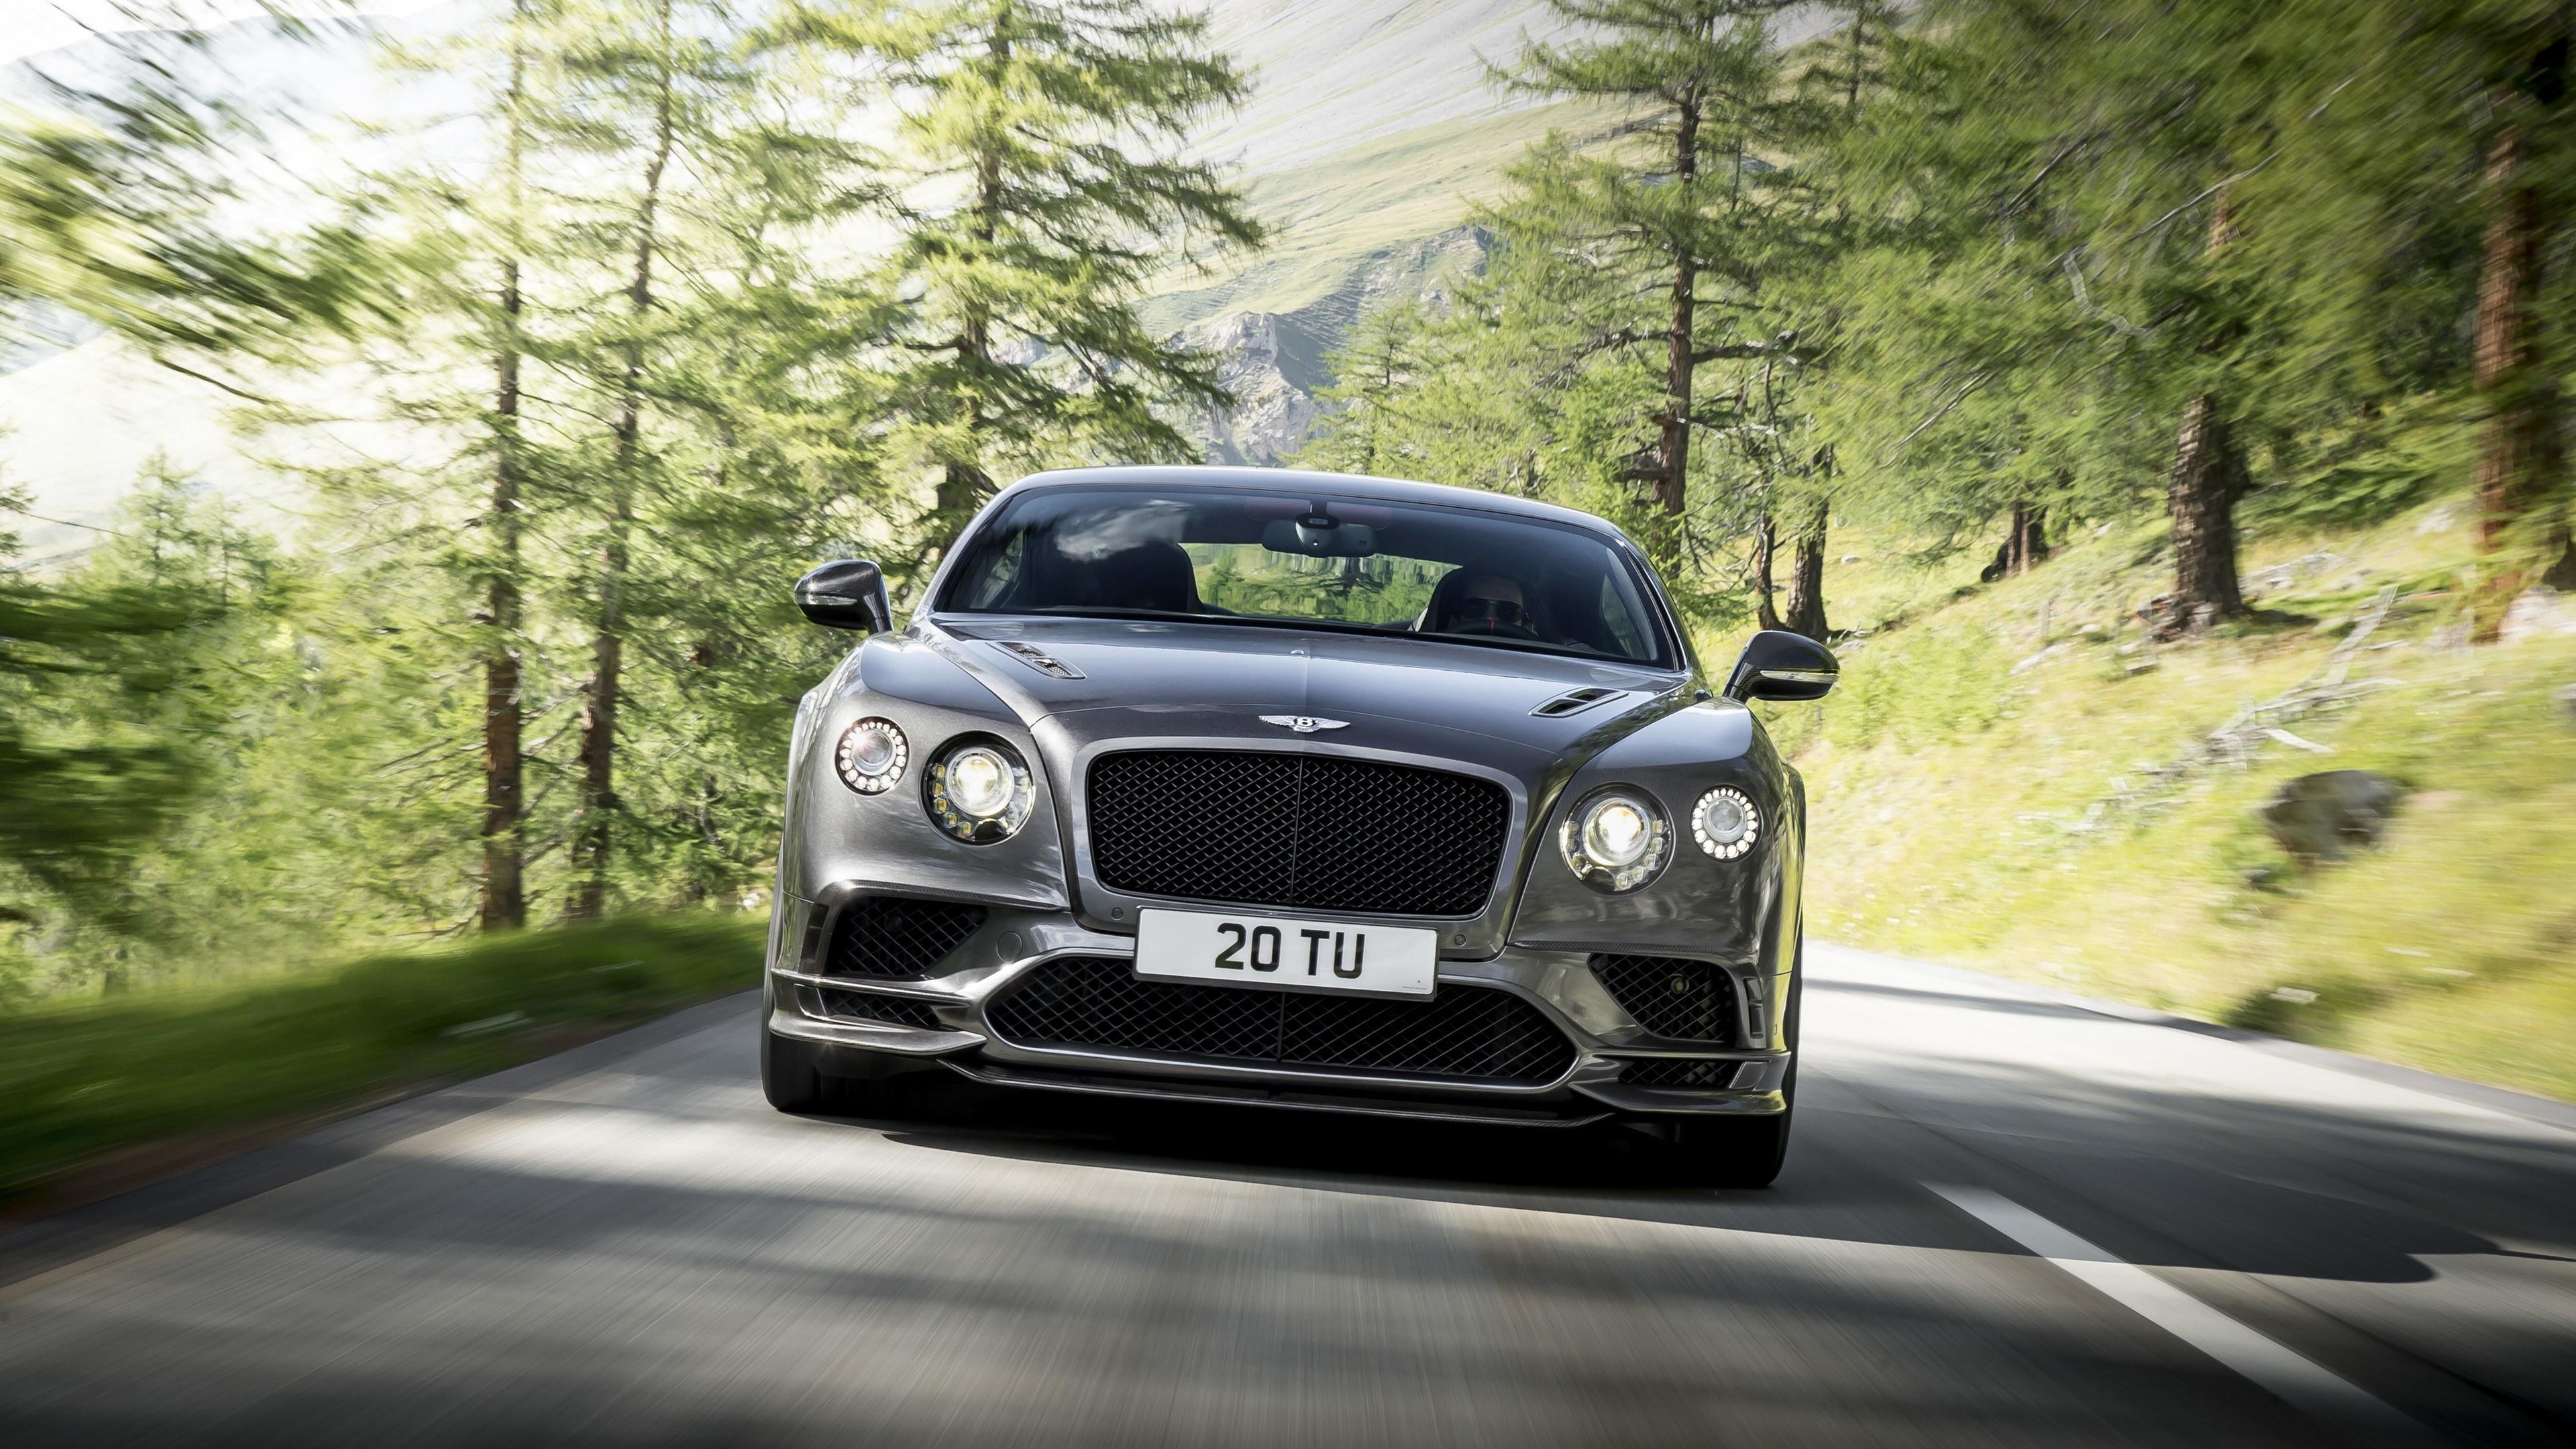 bentley continental gt supersport front 1539113102 - Bentley Continental GT Supersport Front - hd-wallpapers, cars wallpapers, bentley wallpapers, bentley continental gt wallpapers, 5k wallpapers, 4k-wallpapers, 2018 cars wallpapers